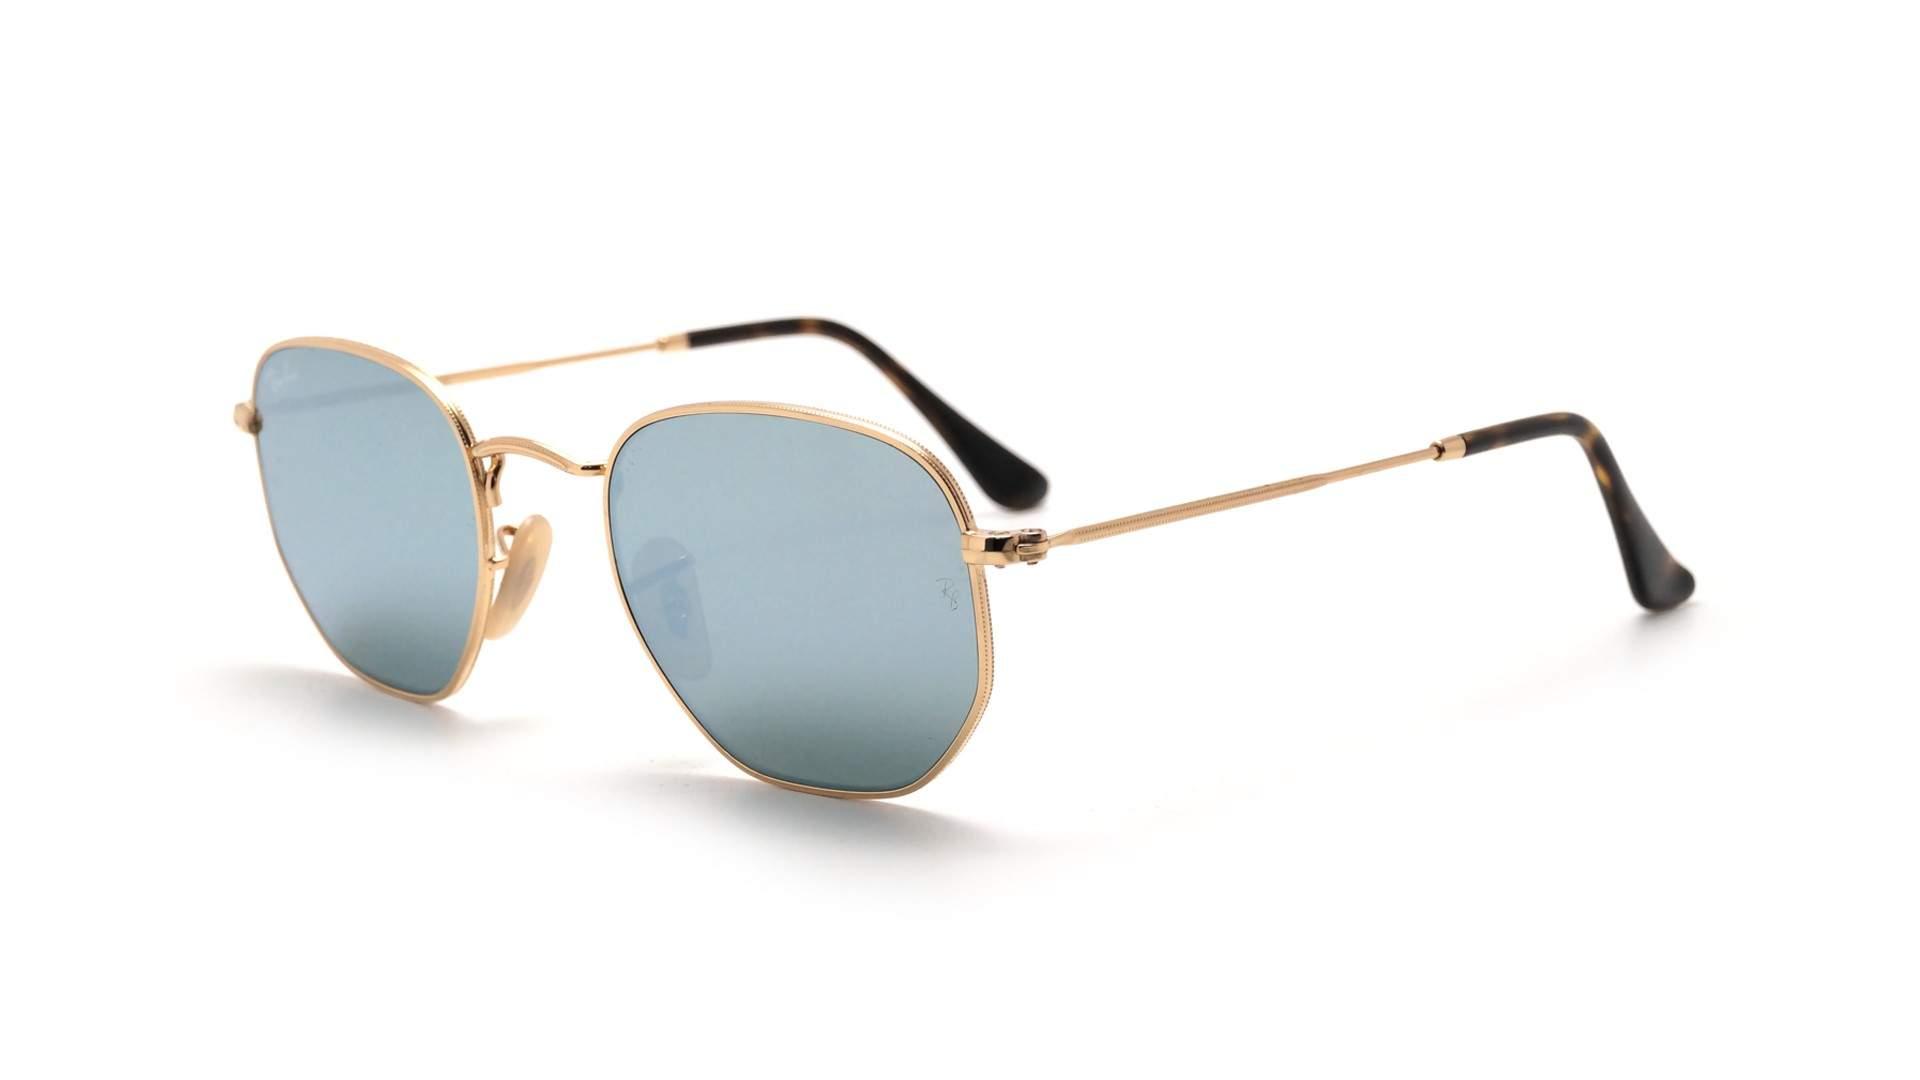 989dcb5755a26 Sunglasses Ray-Ban Hexagonal Flat Lenses Gold RB3548N 001 30 54-21 Large  Flash